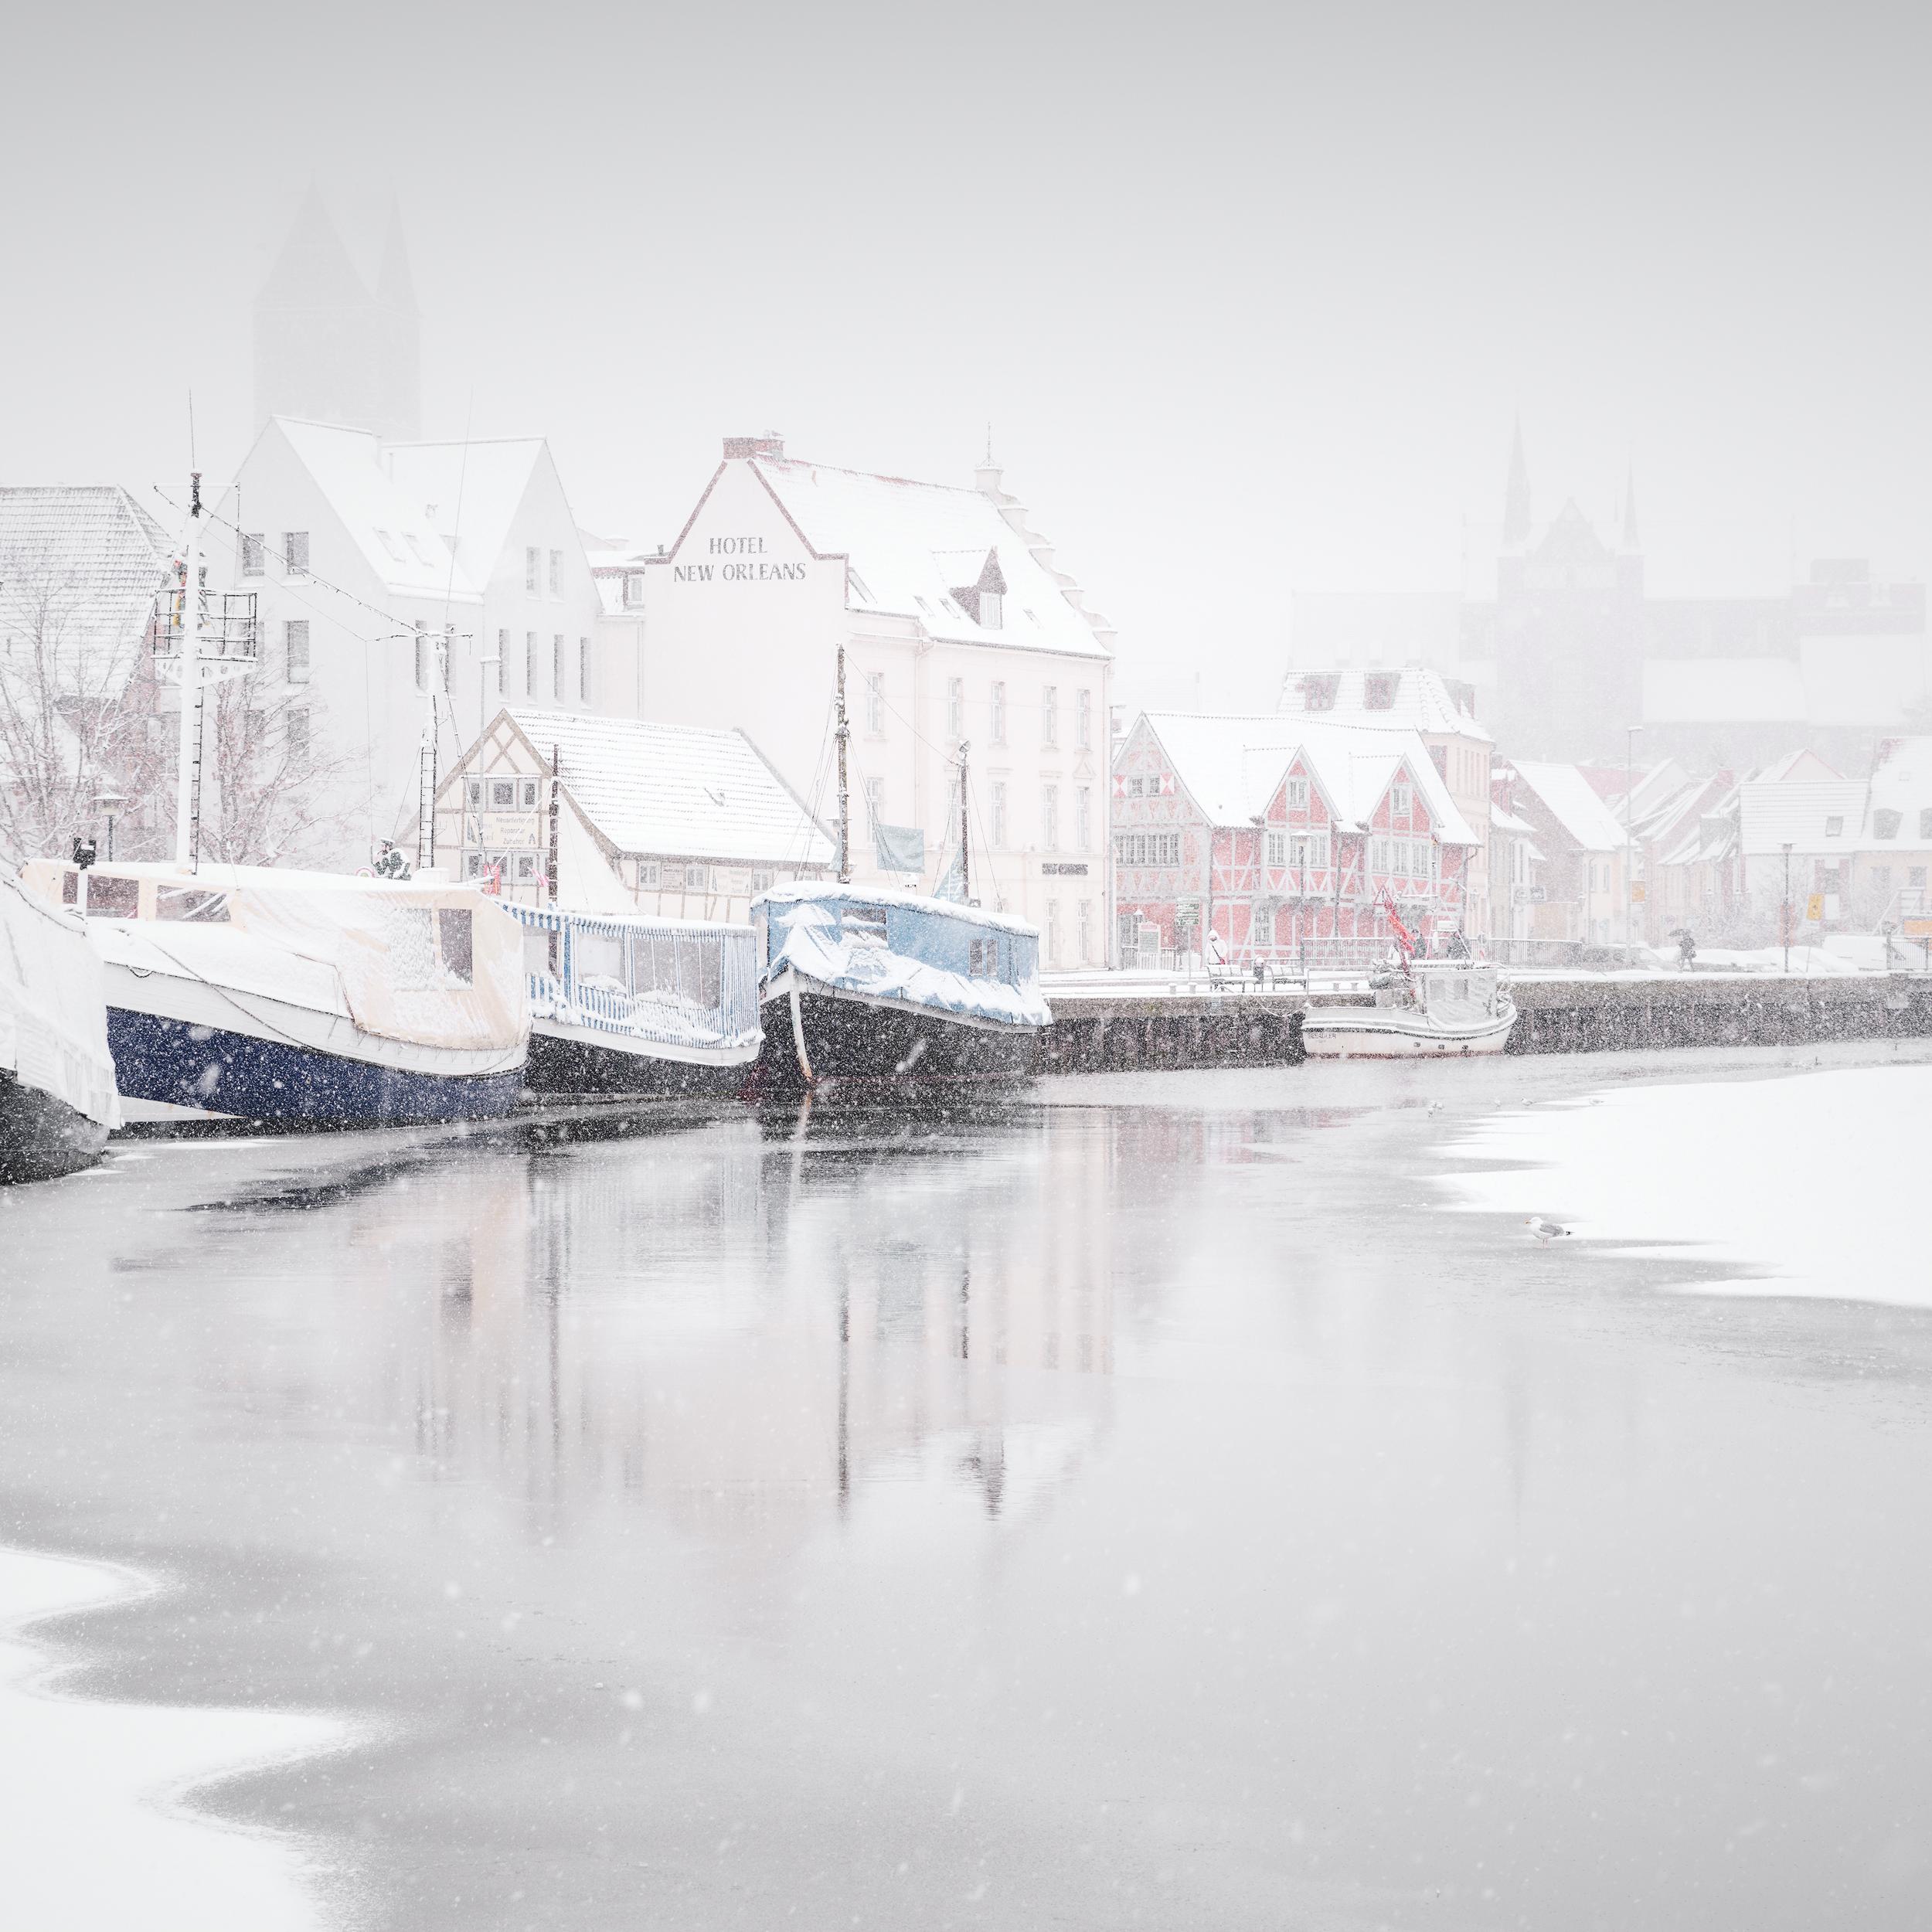 cold harbor I | wismar 2018